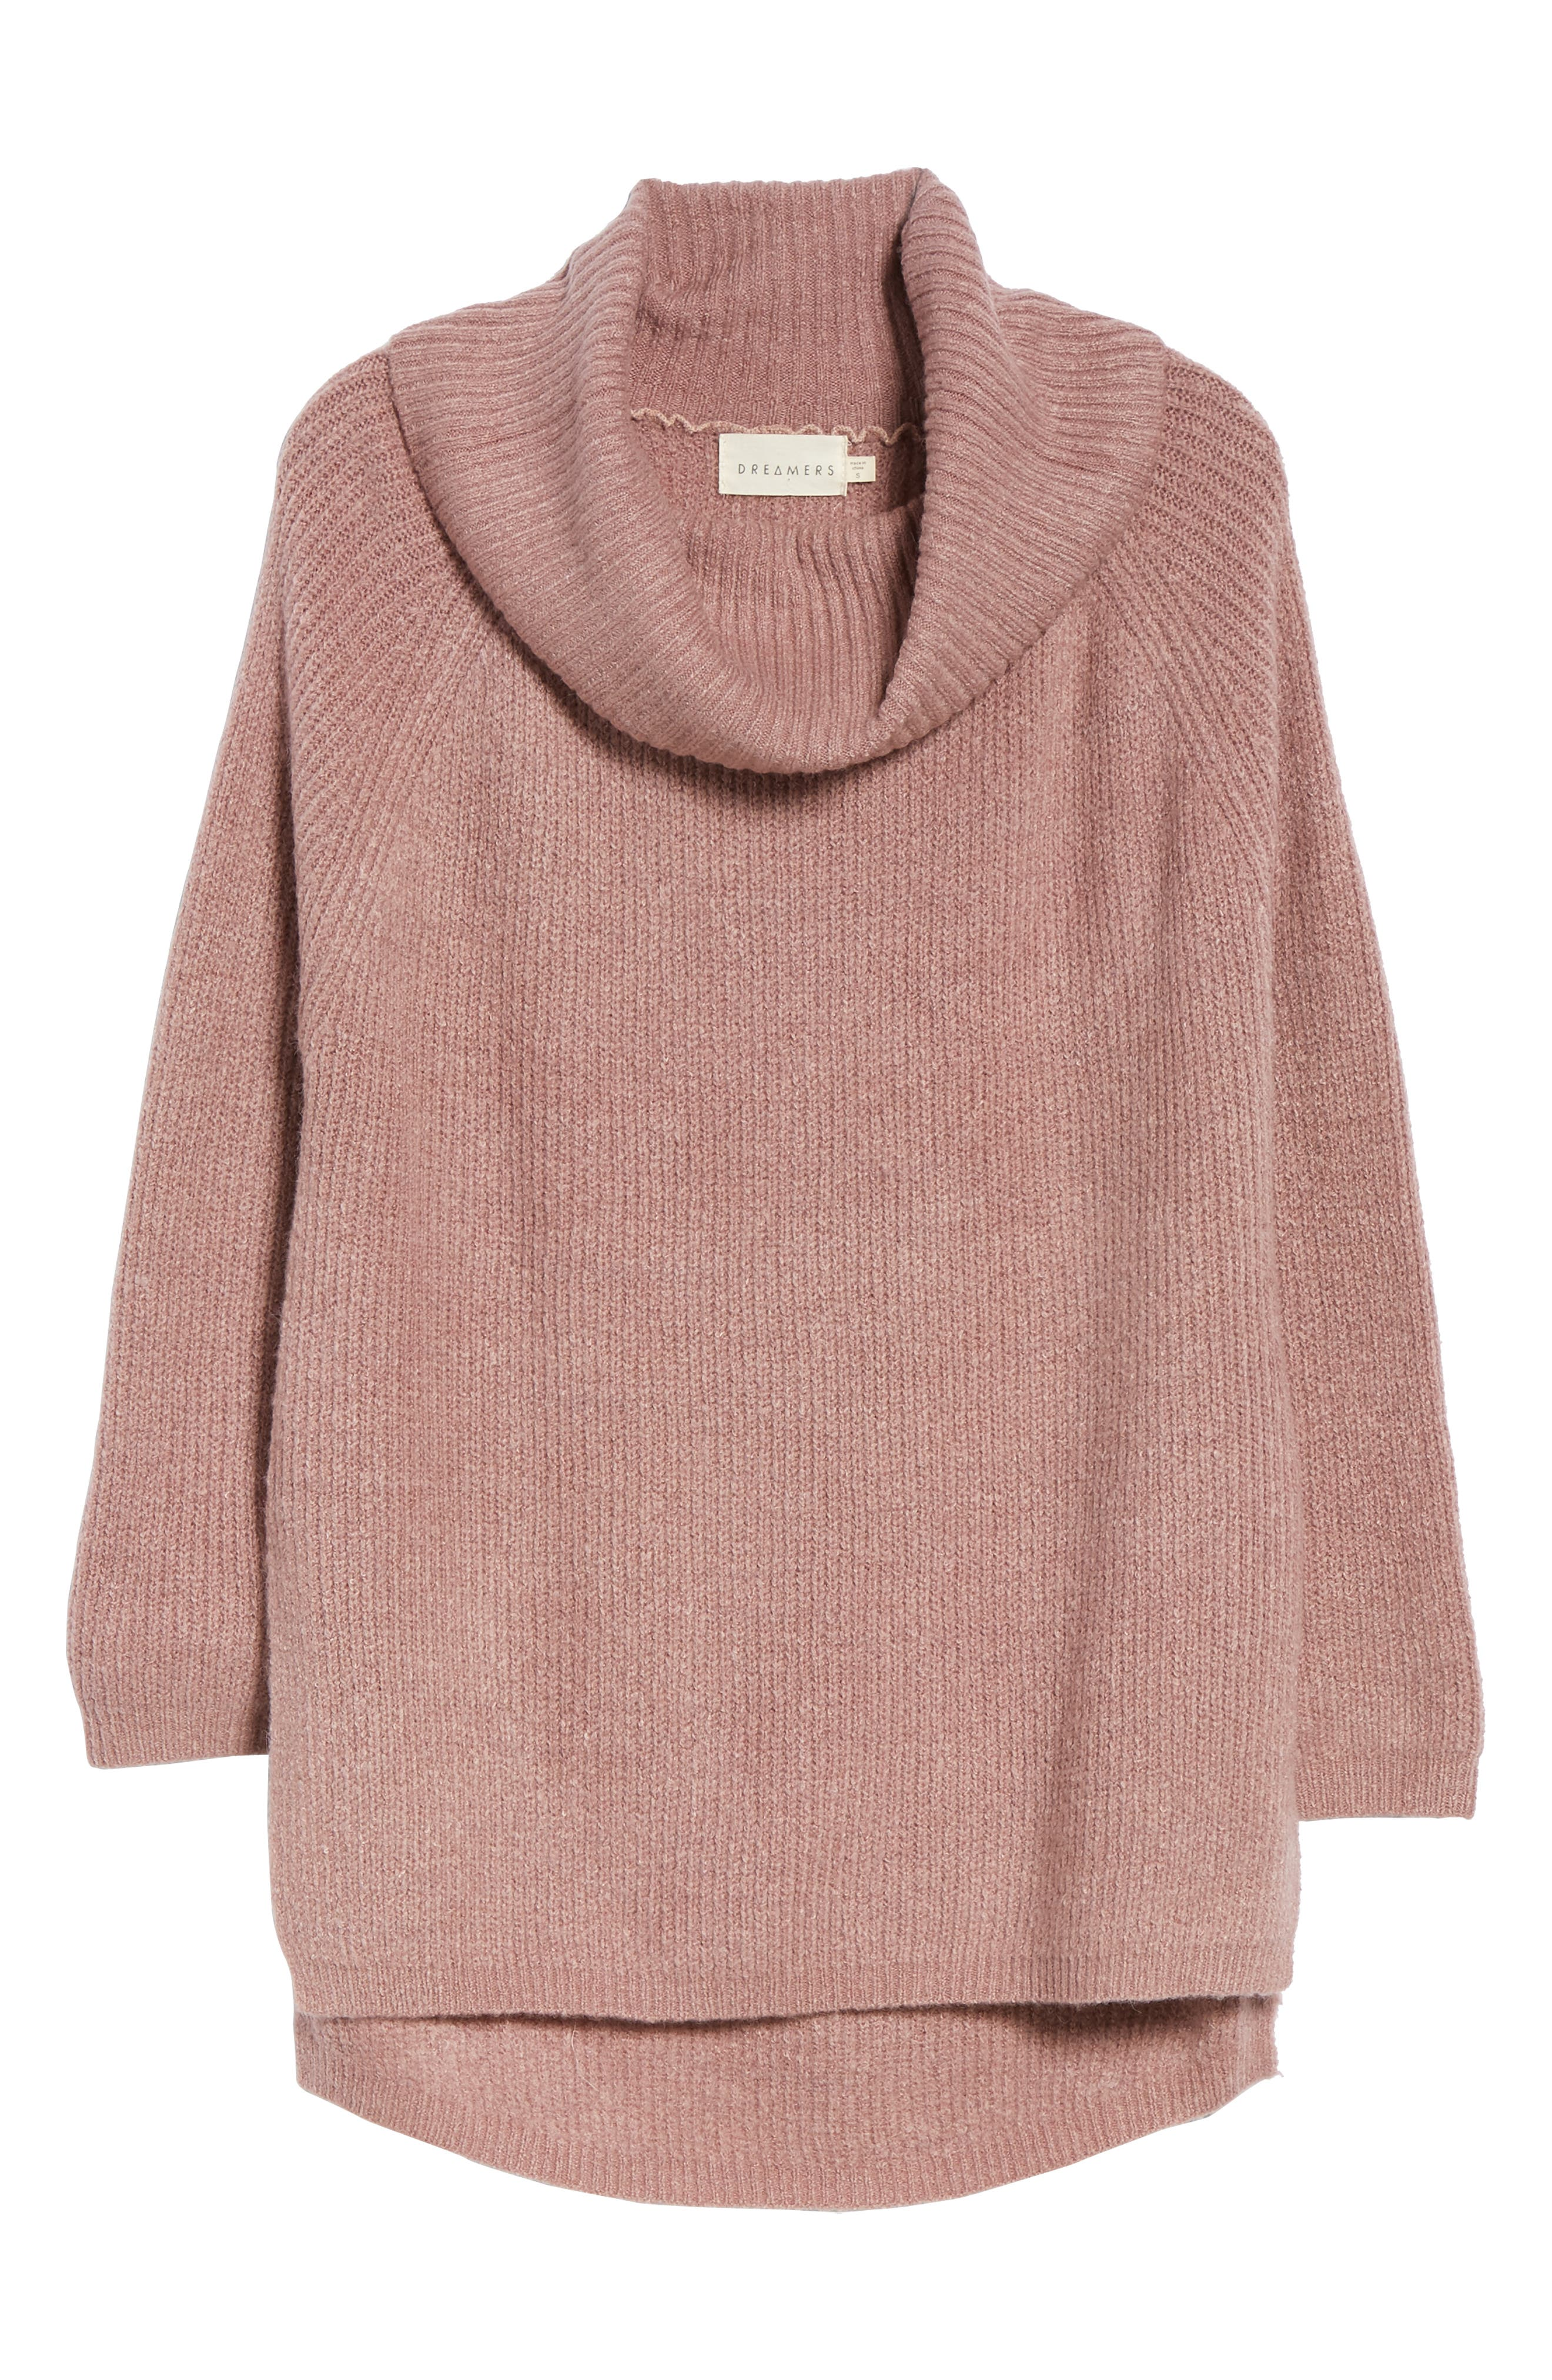 Cowl Neck Sweater,                             Alternate thumbnail 6, color,                             500